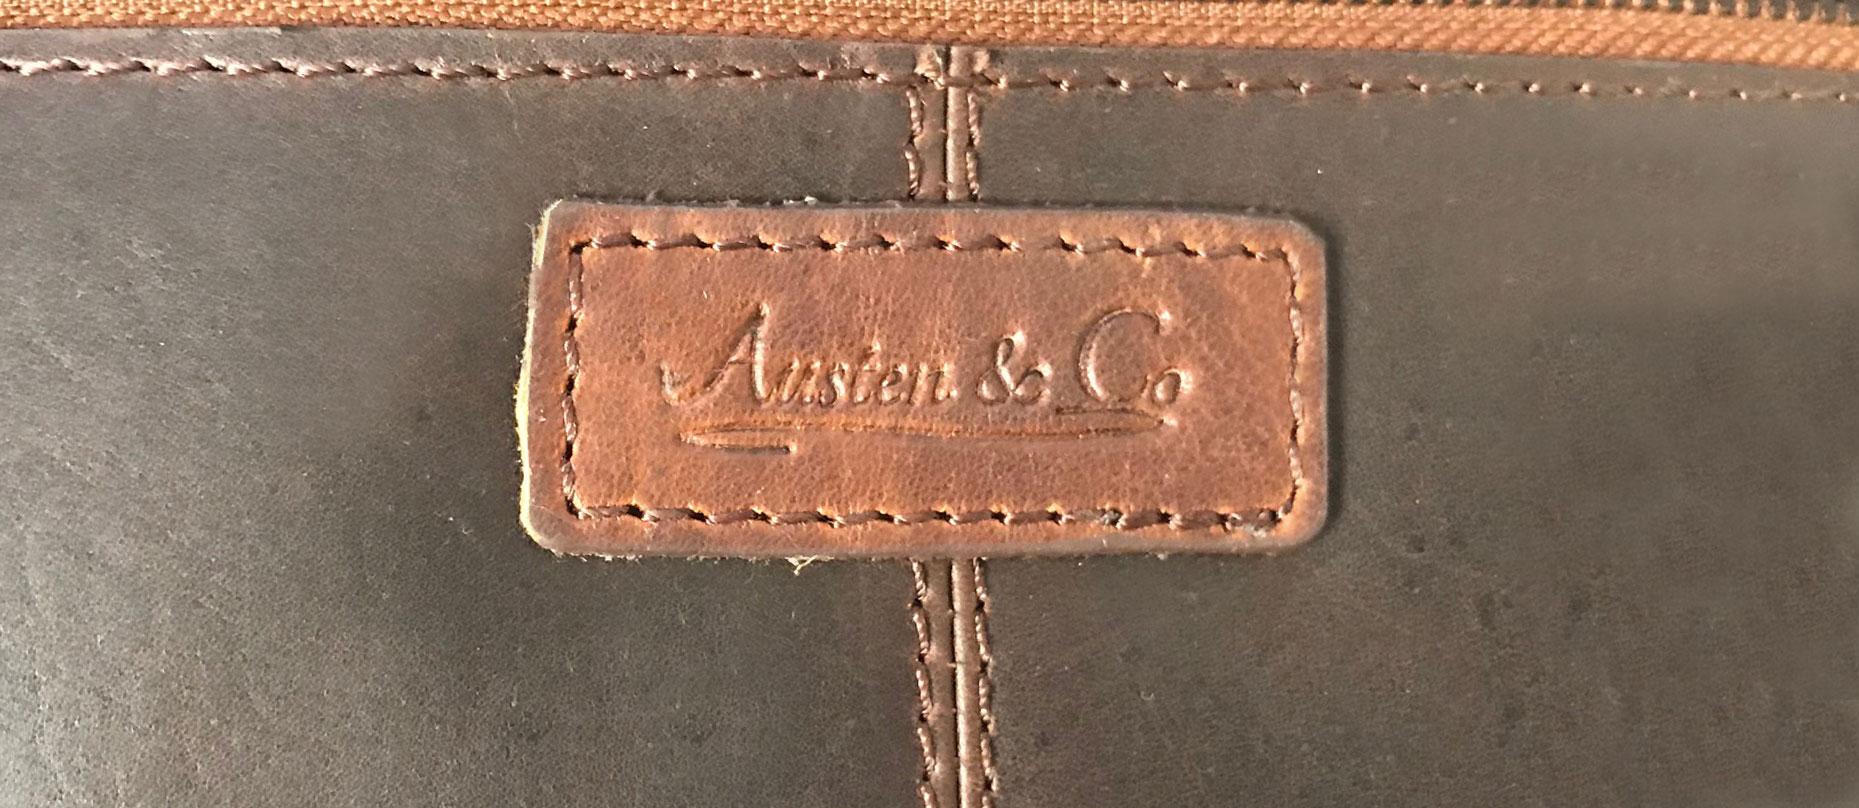 Black Wash Bag Austen & Co Logo